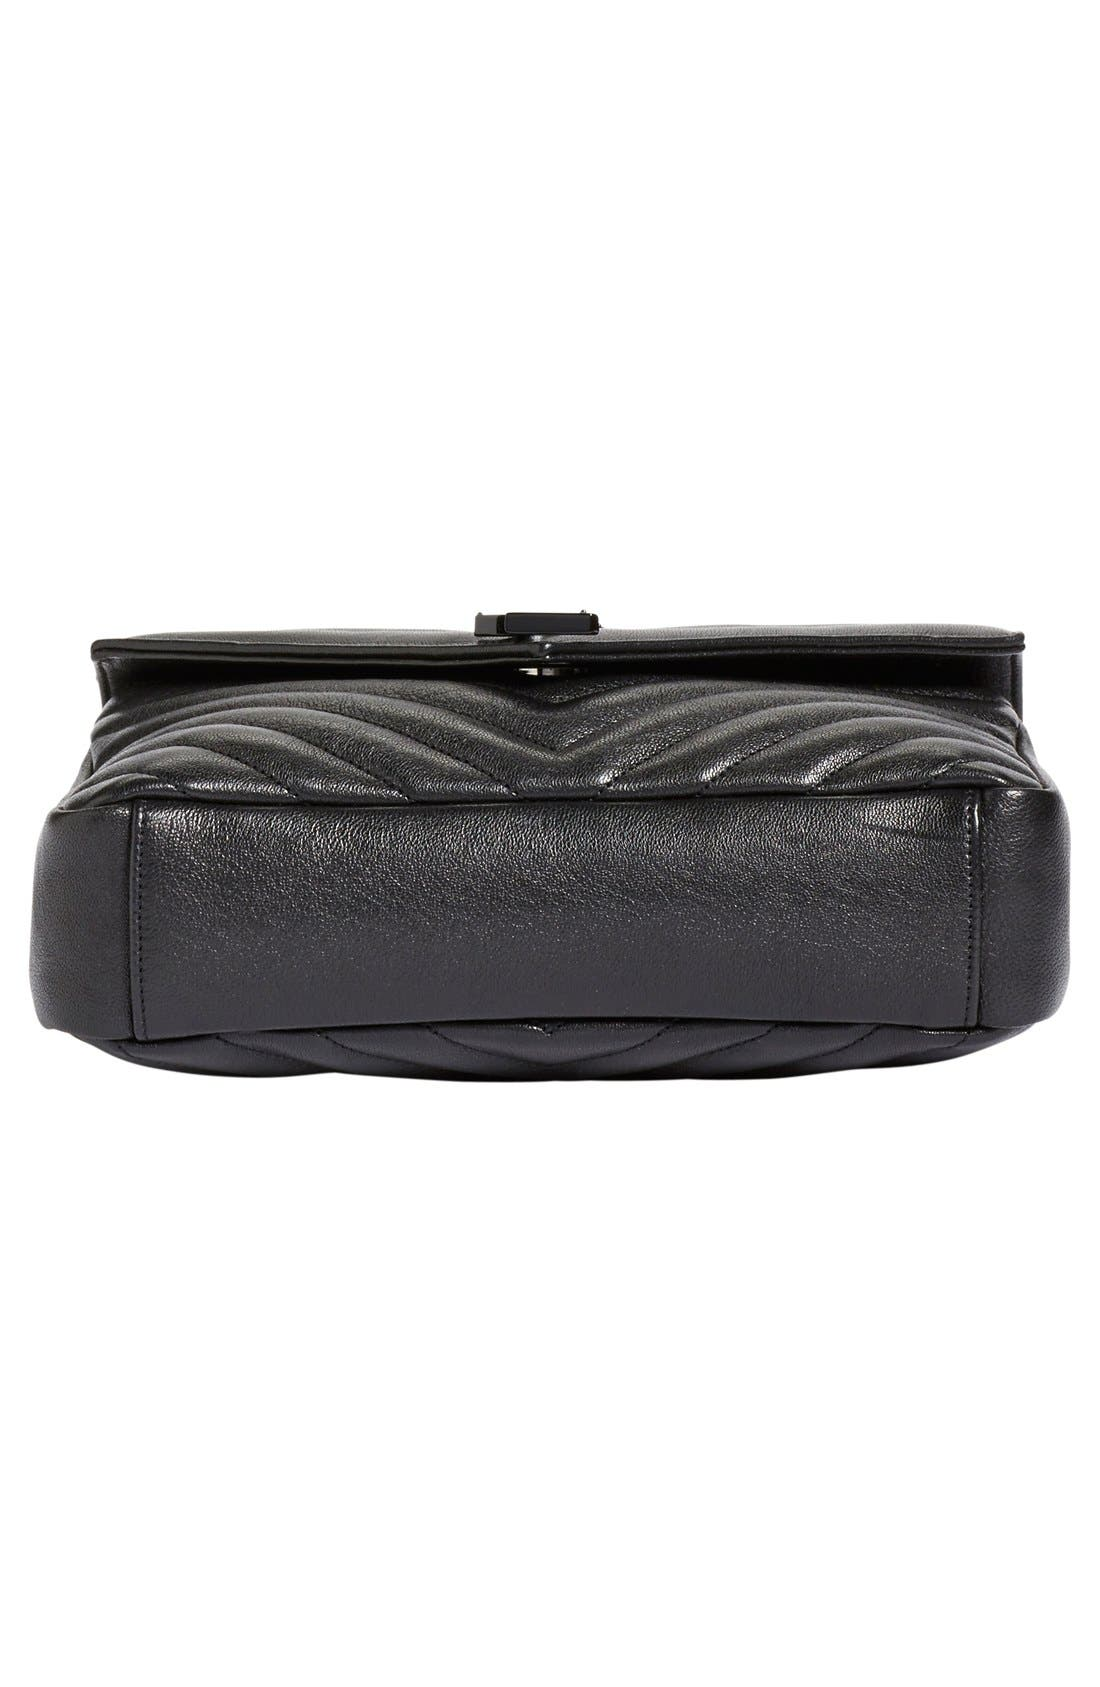 'Medium College' Quilted Leather Shoulder Bag,                             Alternate thumbnail 5, color,                             001